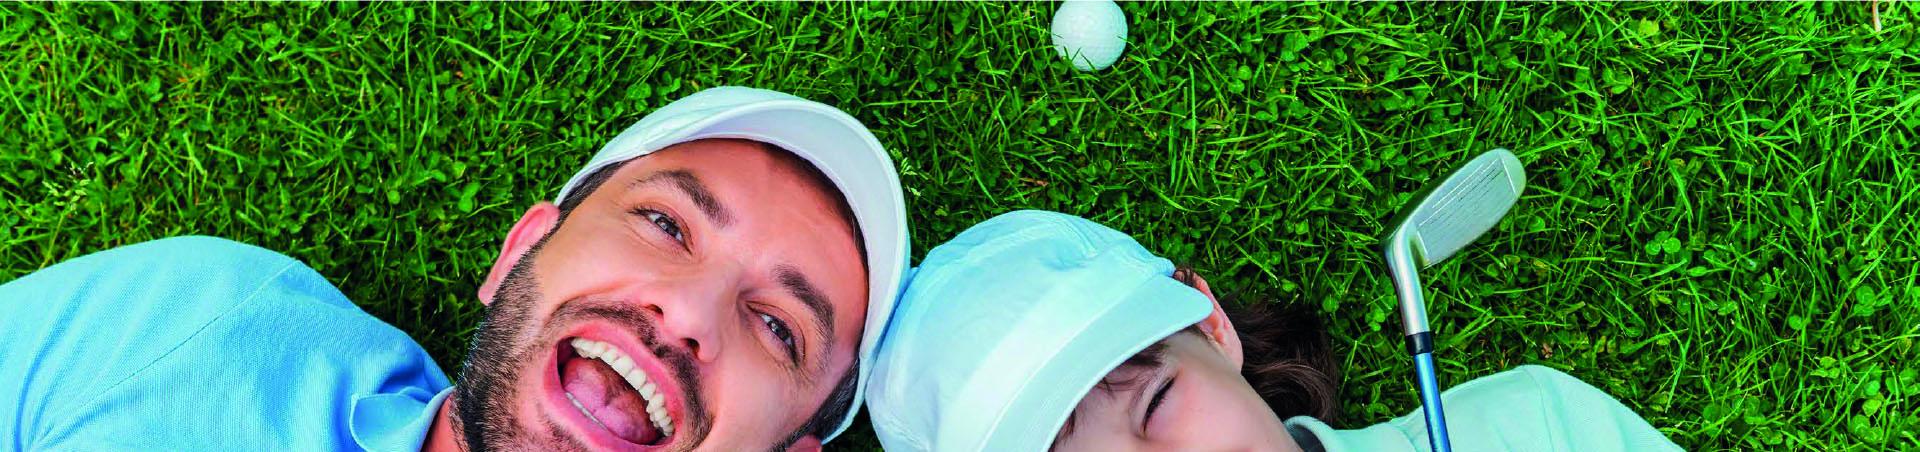 Pa & dochter golfen